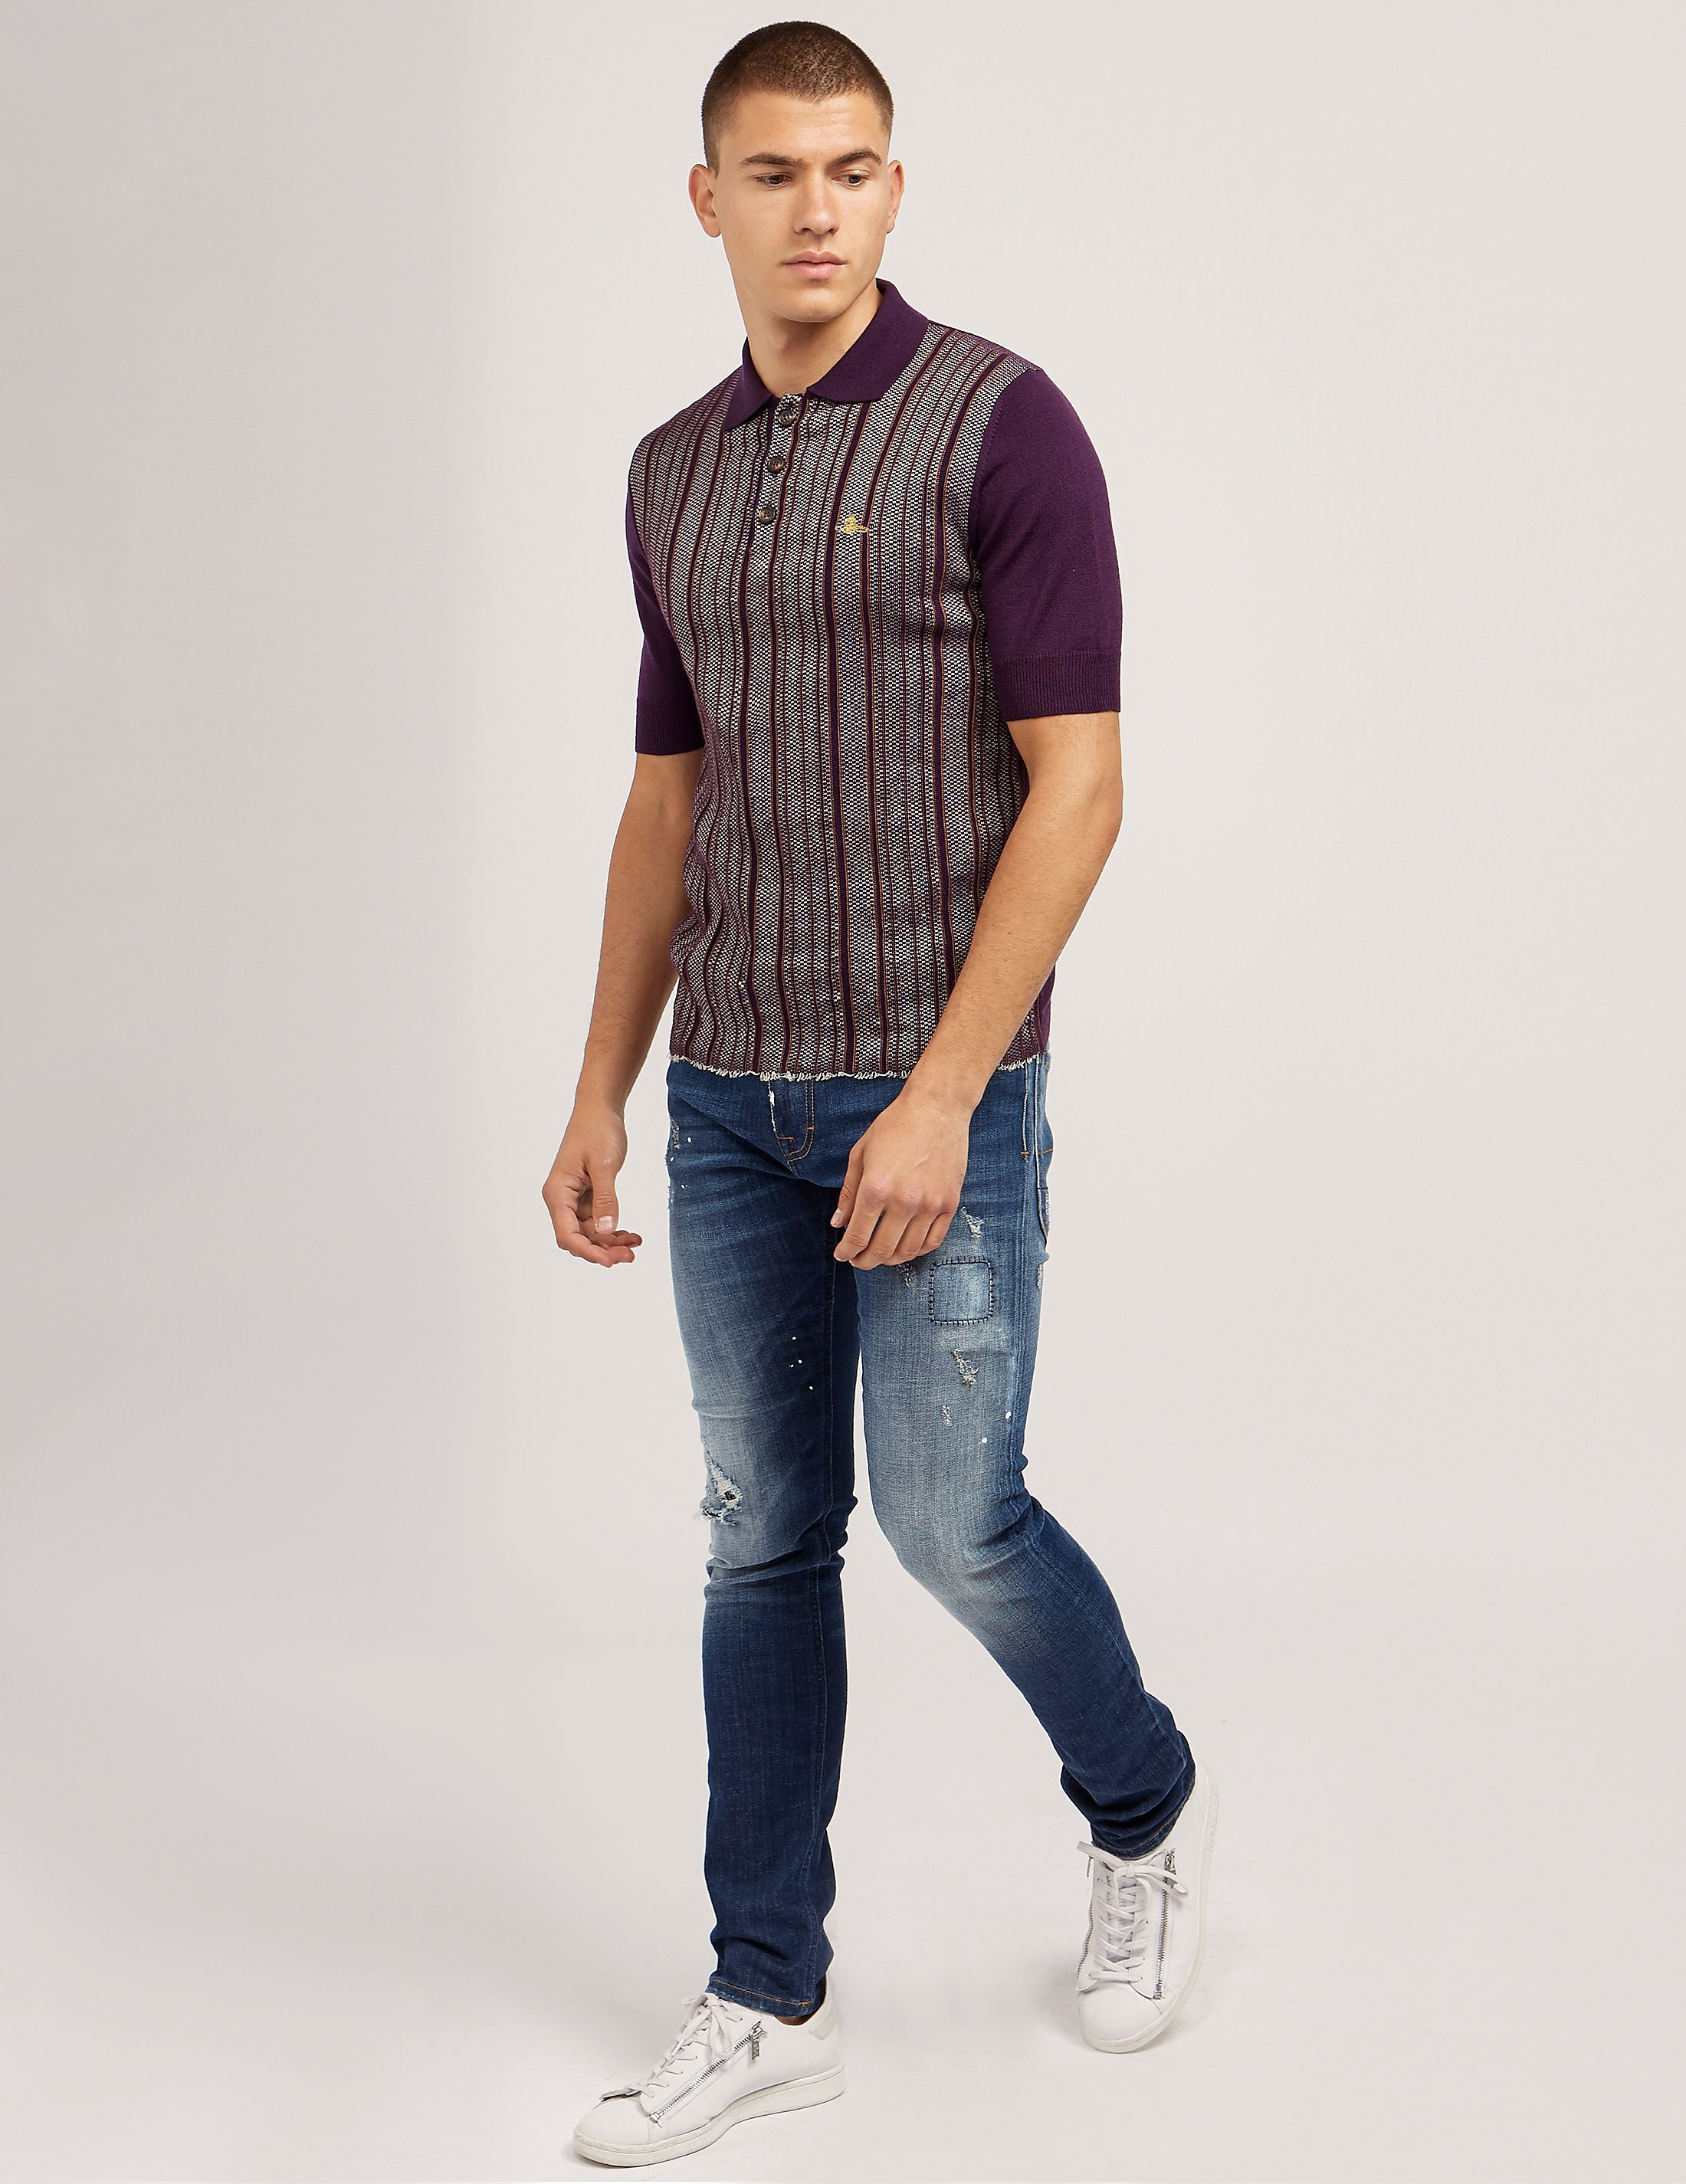 Vivienne Westwood Stripe Knit Short Sleeve Polo Shirt